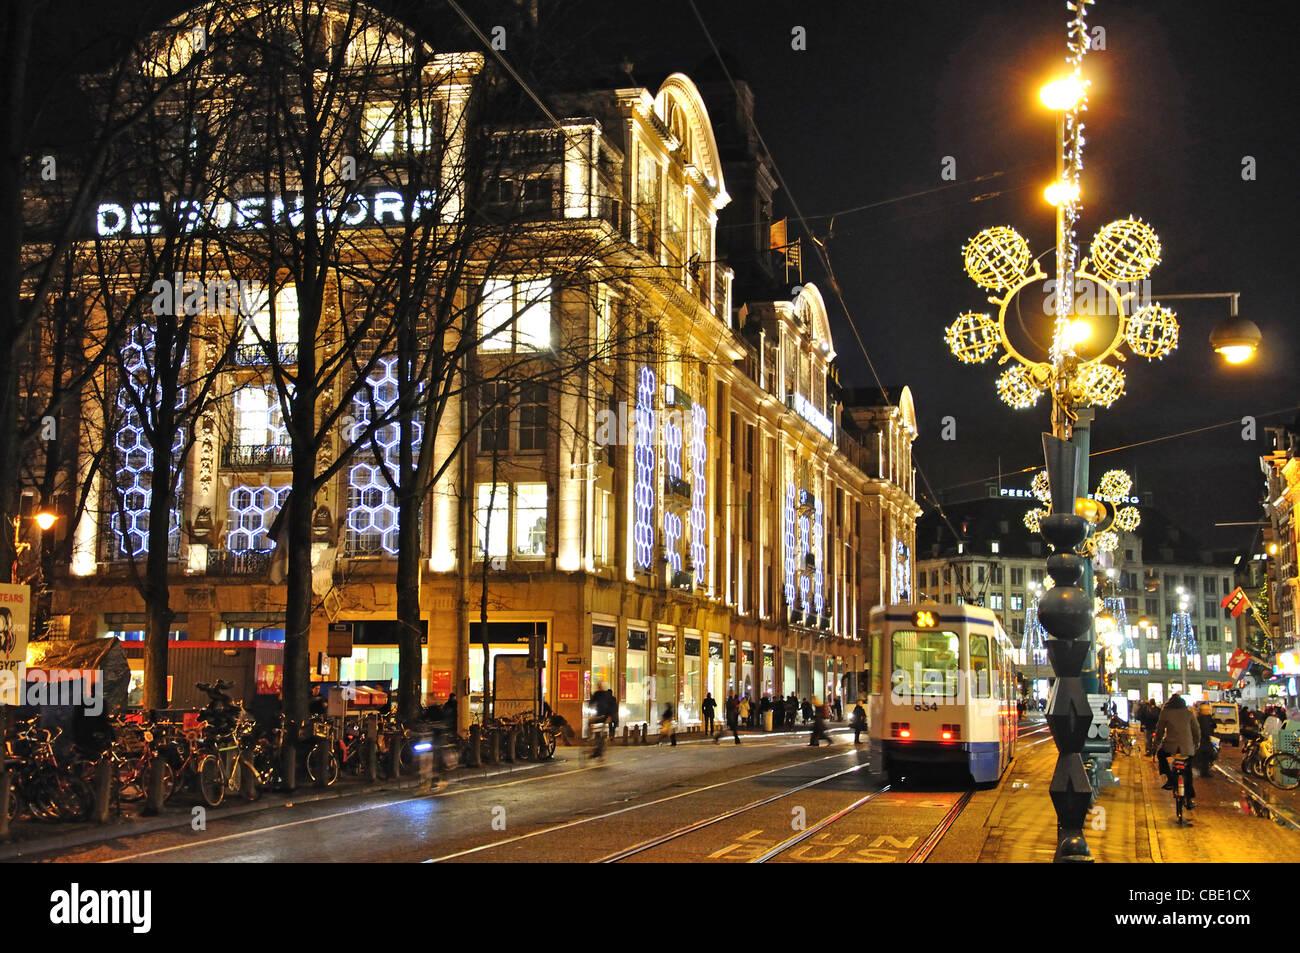 De Bijenkorf department store at night, Damrak, Amsterdam, Noord-Holland, Kingdom of the Netherlands - Stock Image